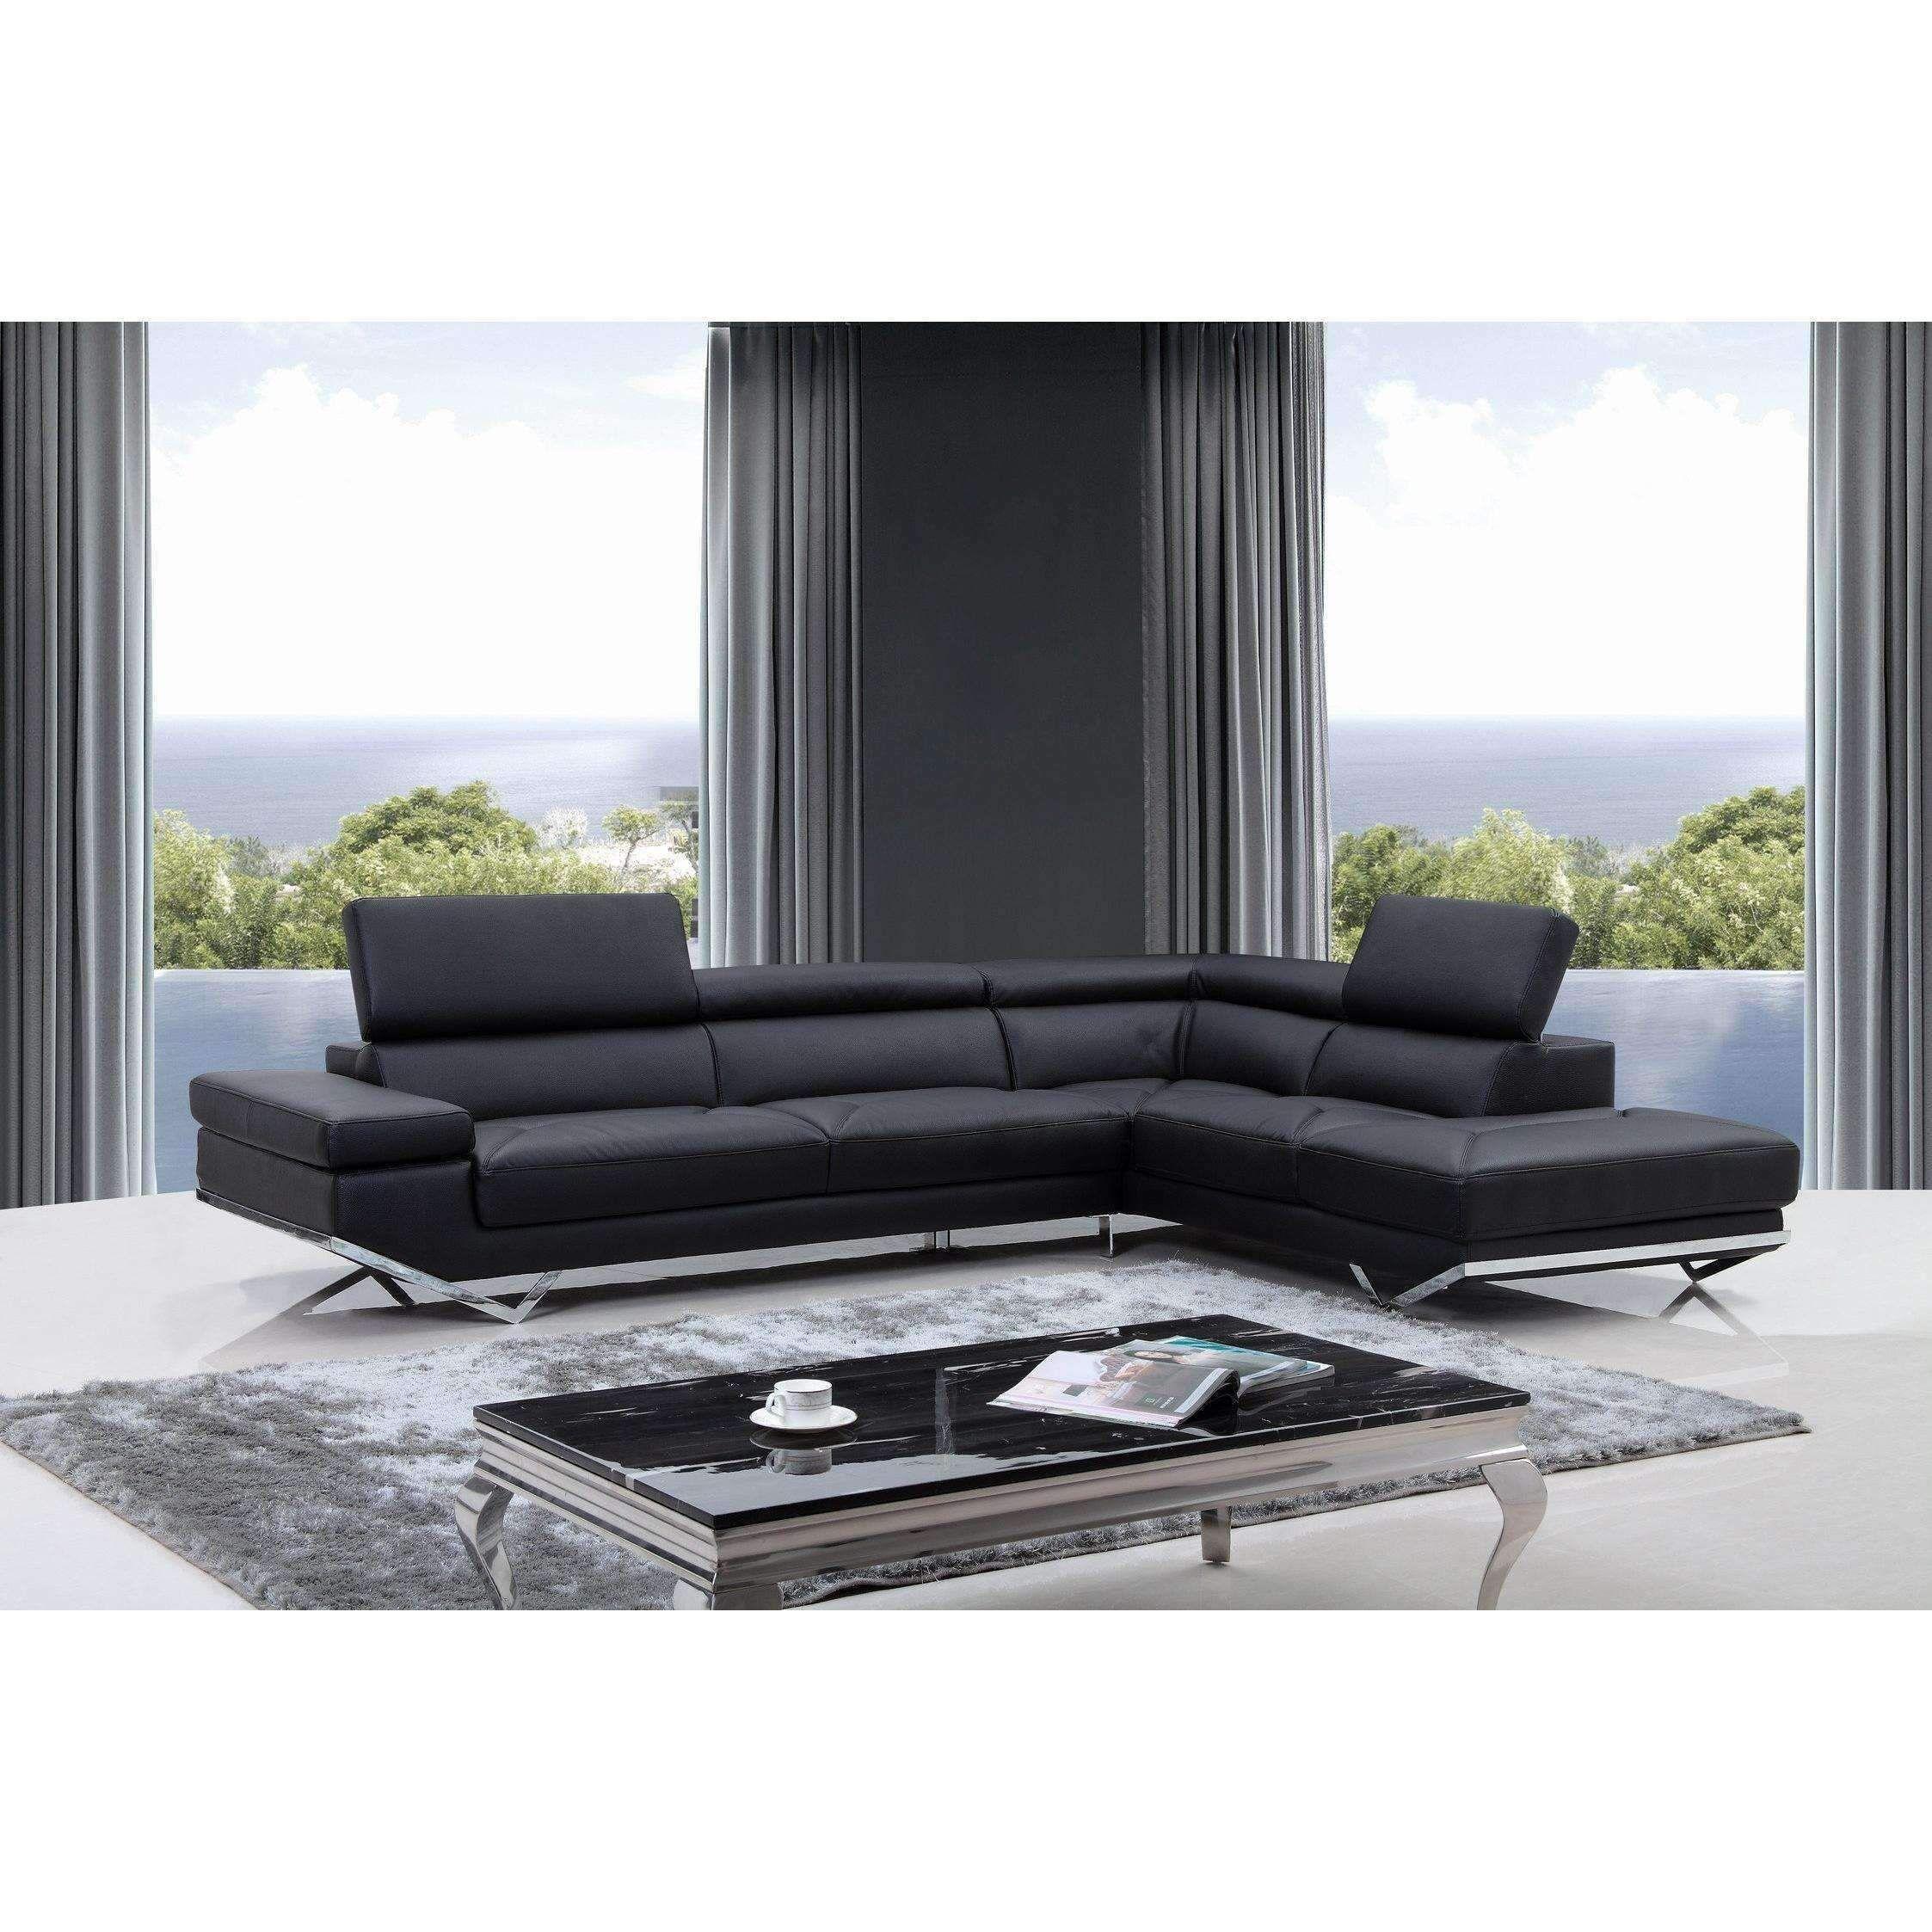 Divani casa quebec modern black eco leather sectional sofa